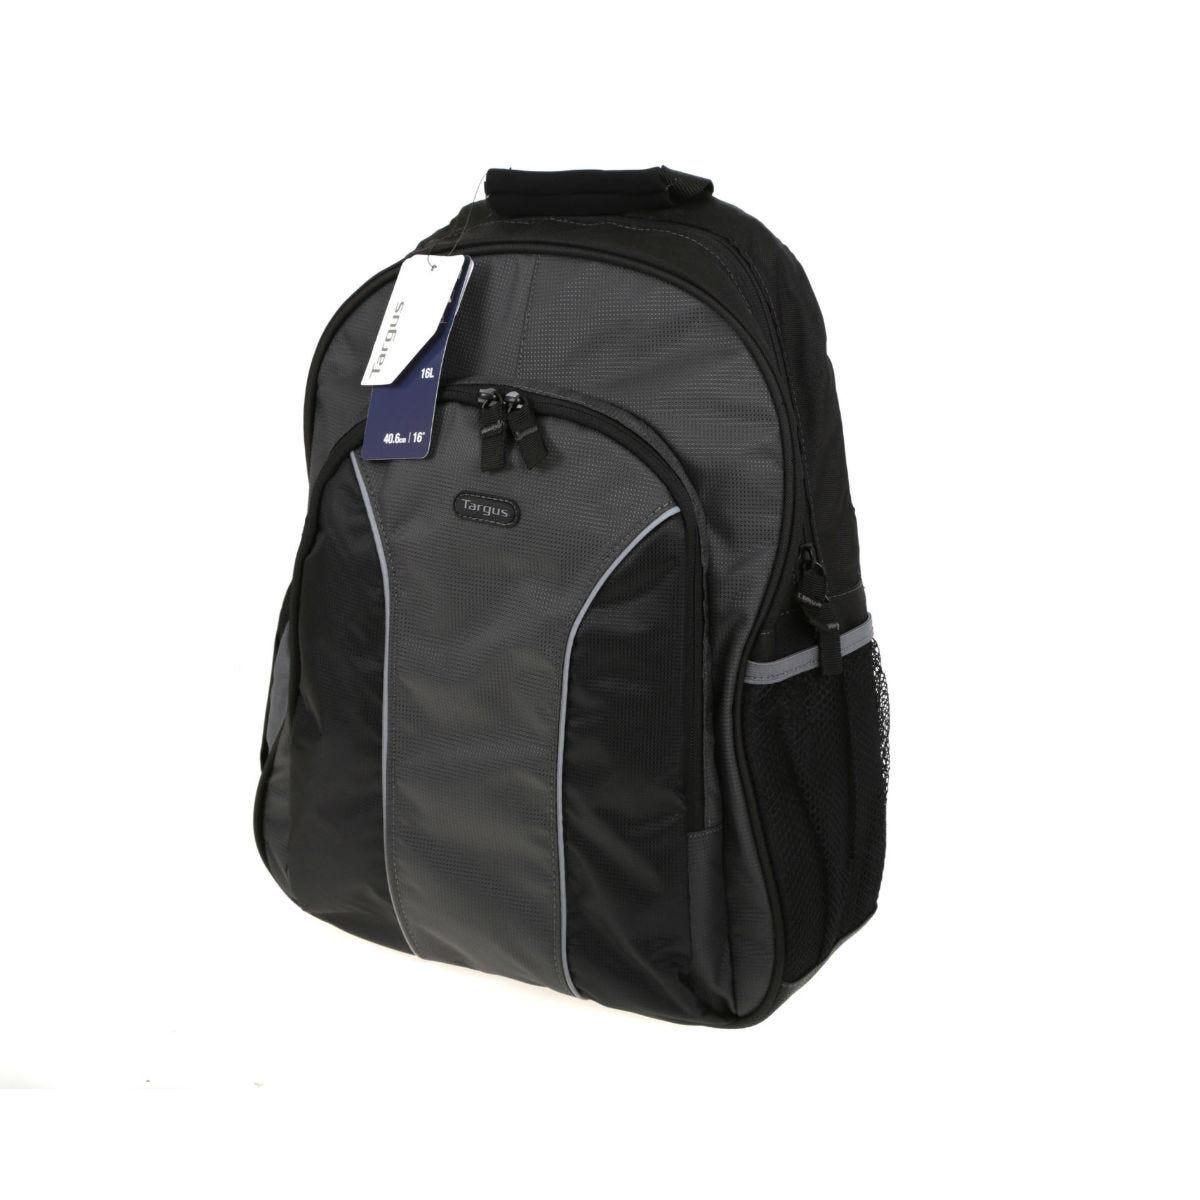 Targus Essential Laptop Backpack 16 Inch